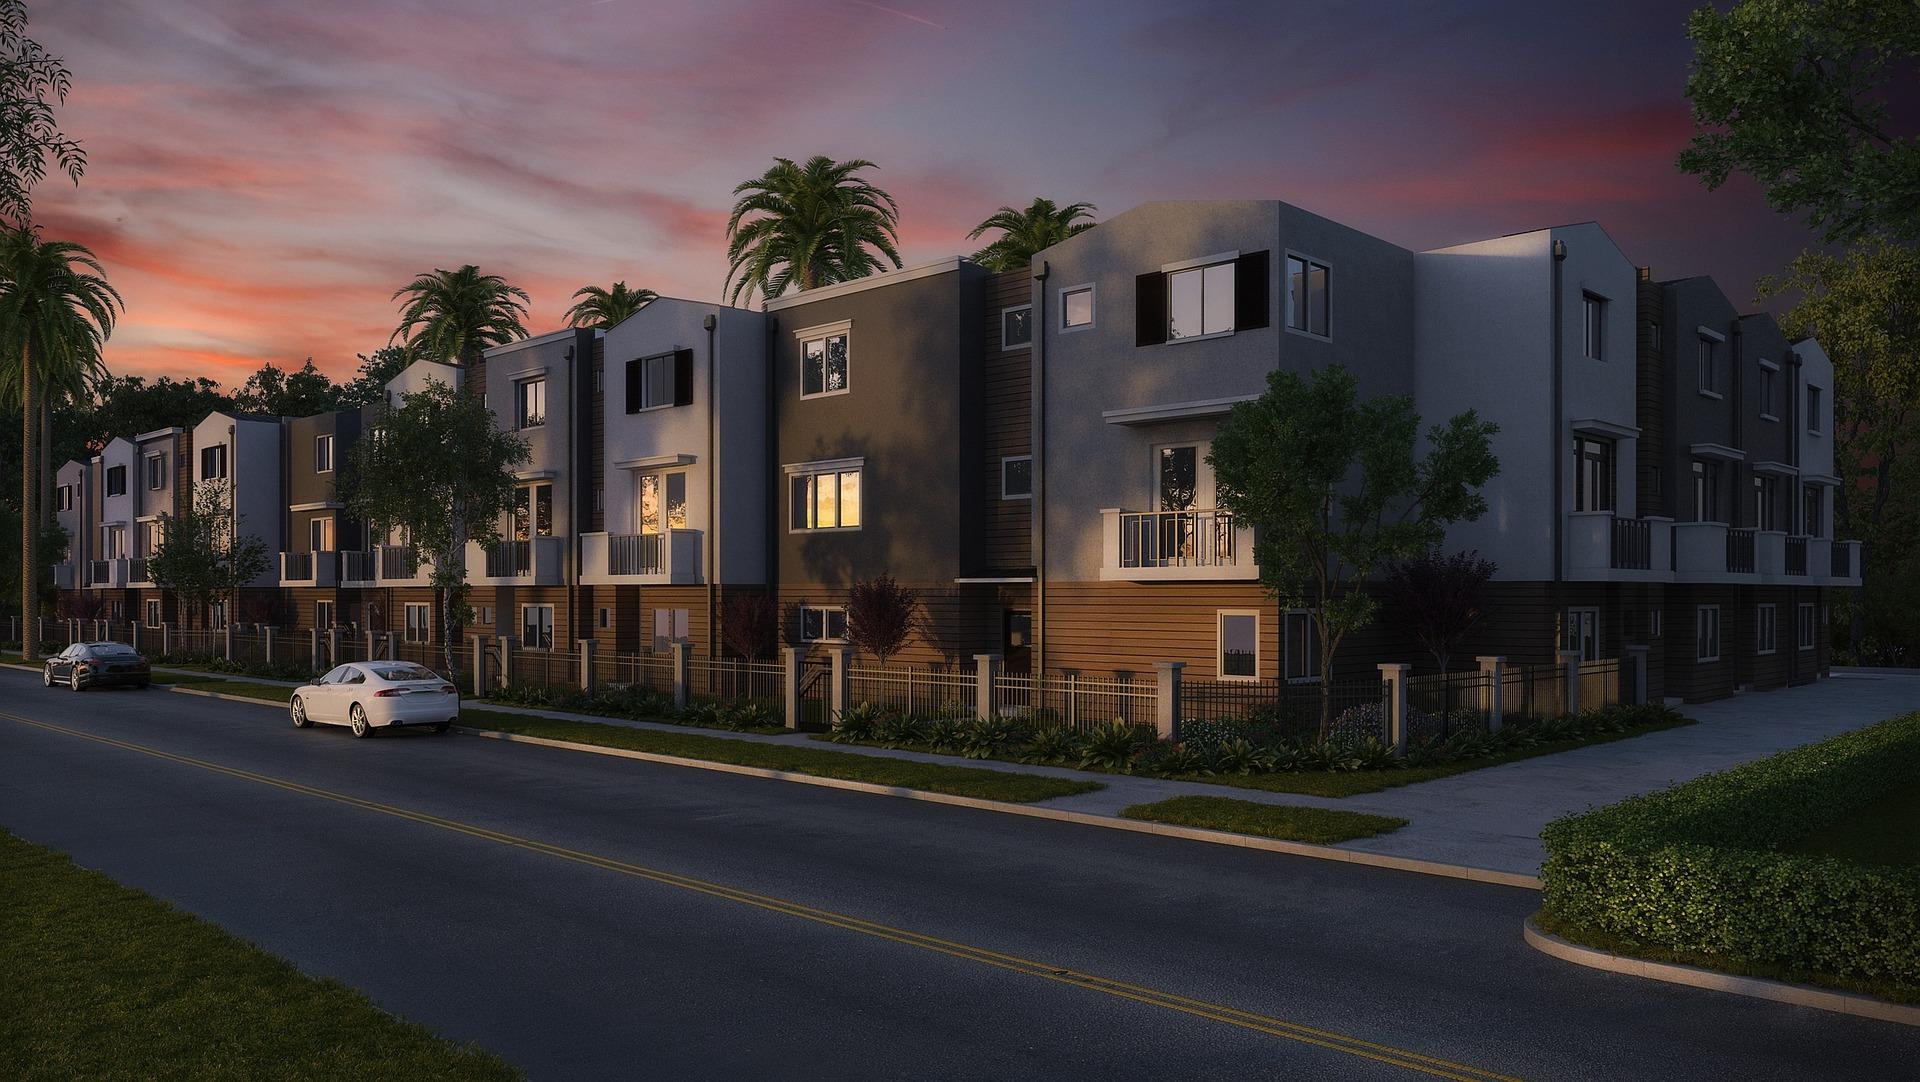 Homeowners Association, Condominium Association, & Community Association Disputes